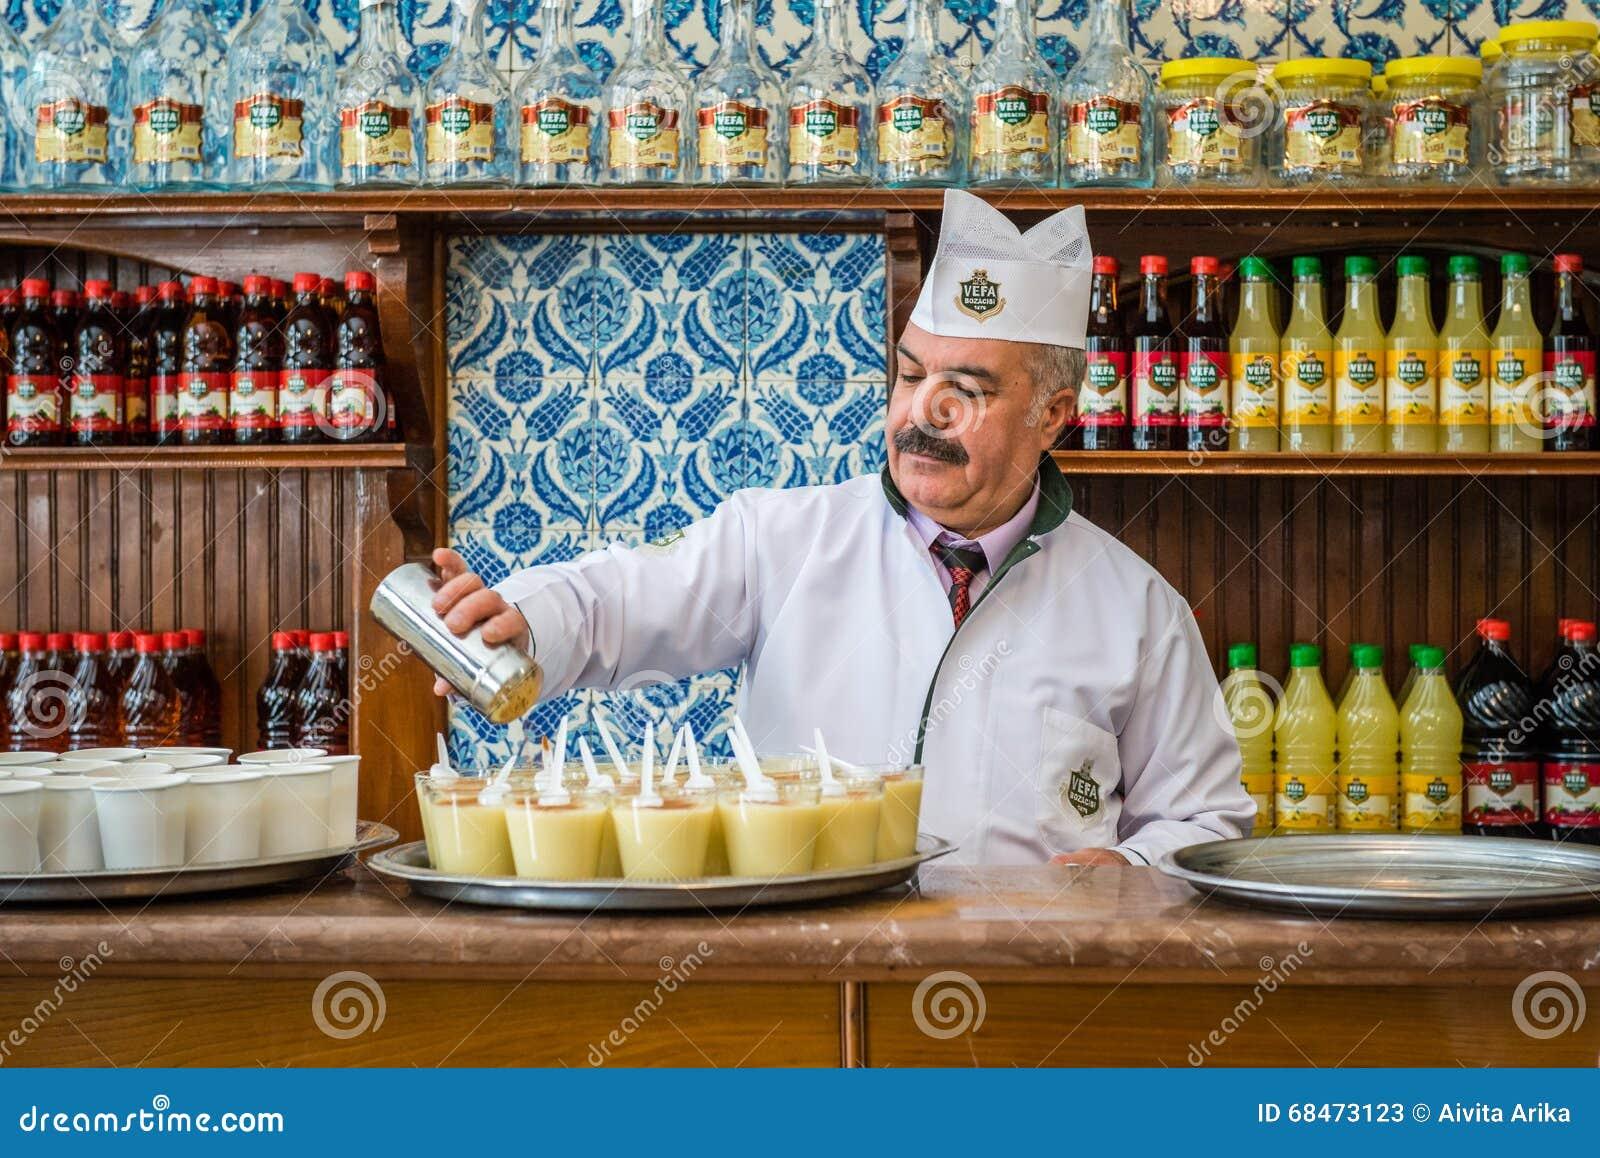 Boza-Verkäufer In Istanbul, Die Türkei Redaktionelles Stockfoto ...